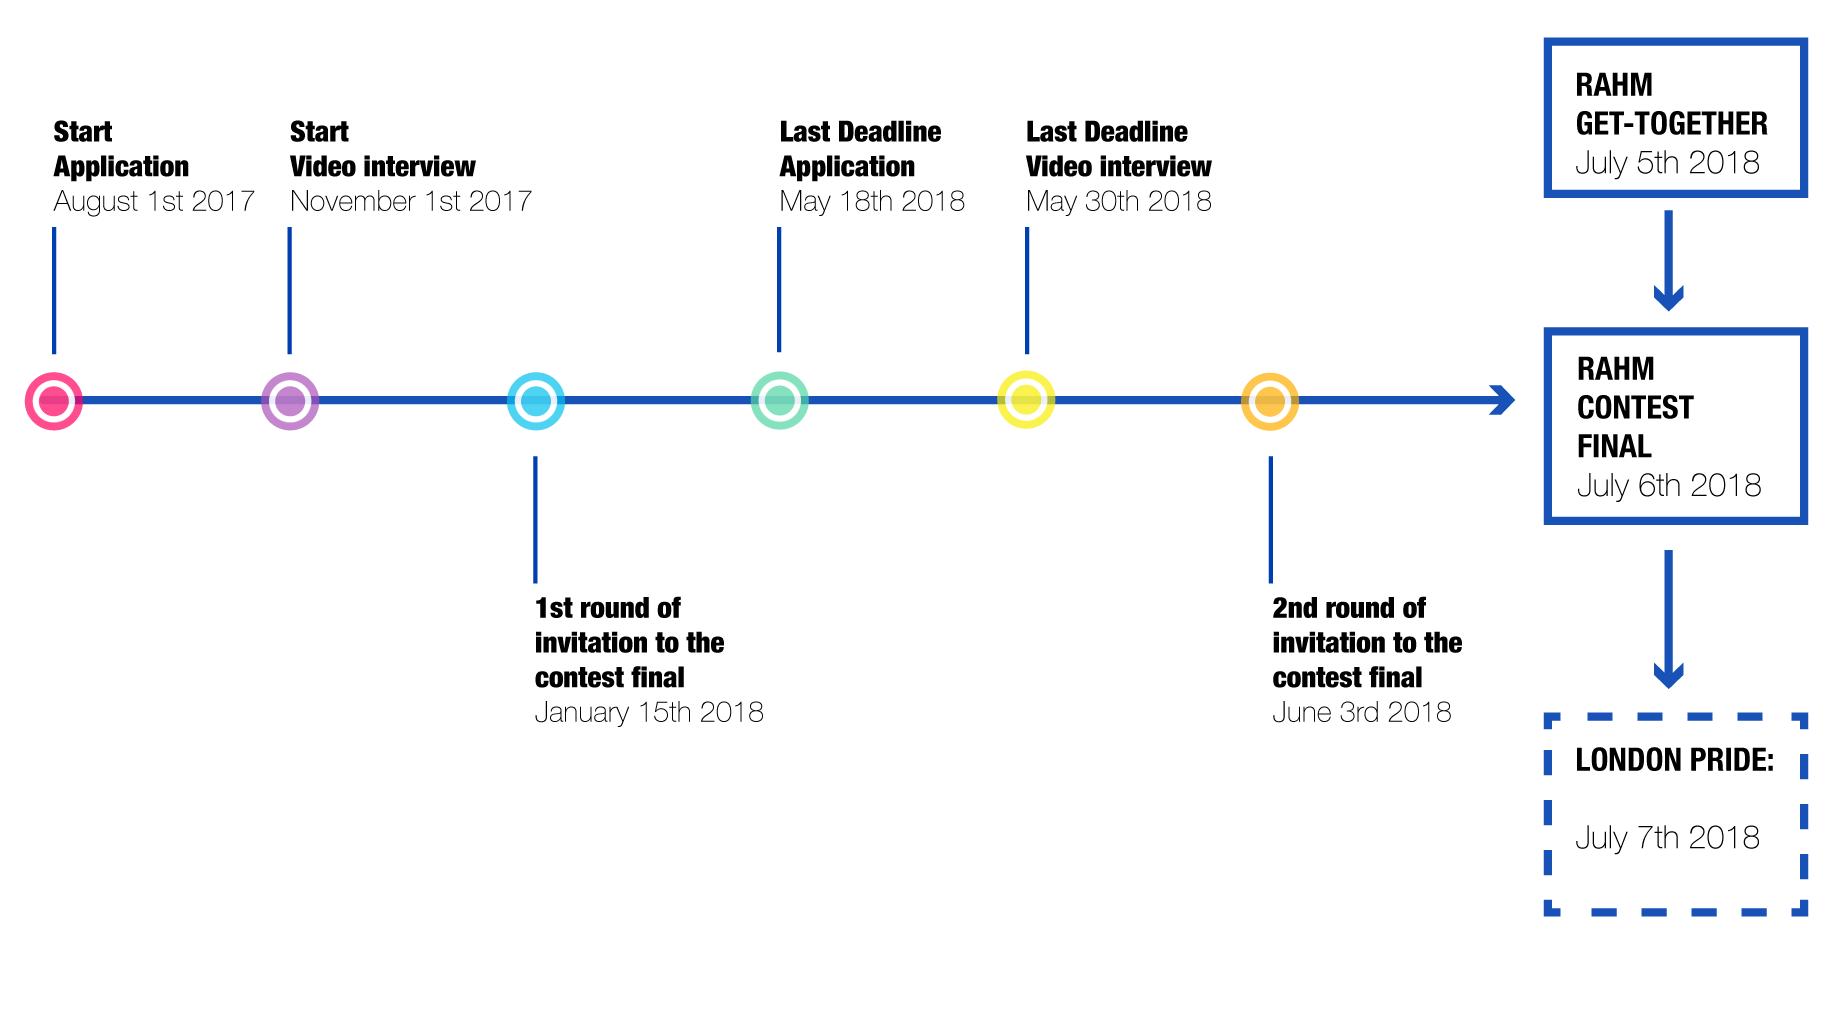 Timeline Application RAHM London 2018